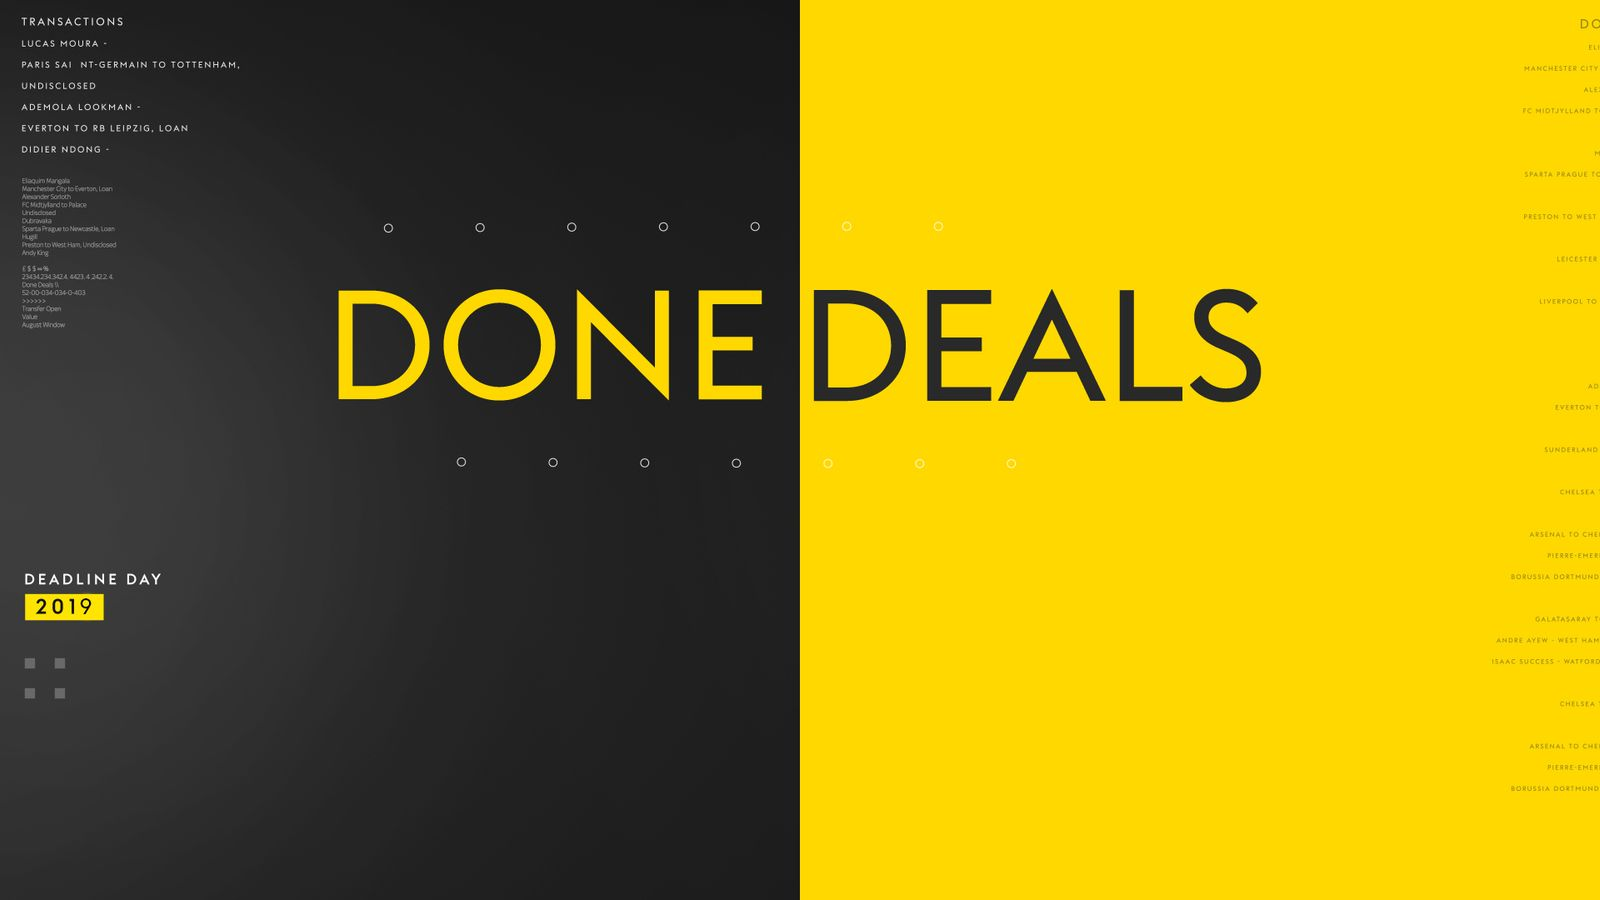 Summer transfer window 2020: Done deals in July, August